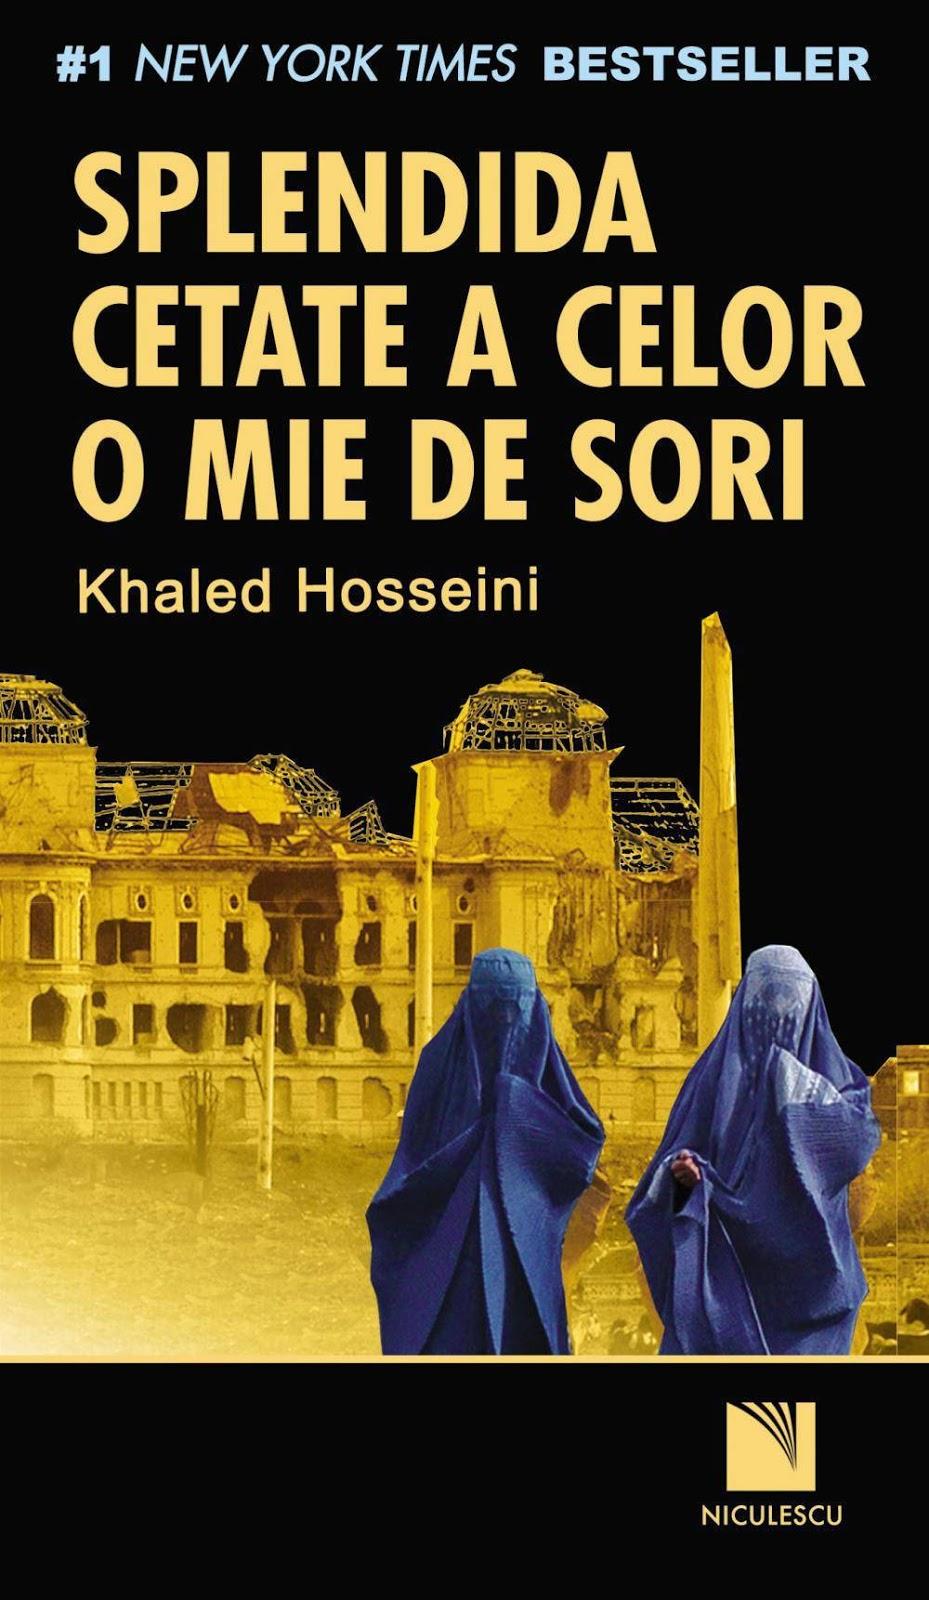 fors  khaled hosseini splendida cetate a celor o mie de sori